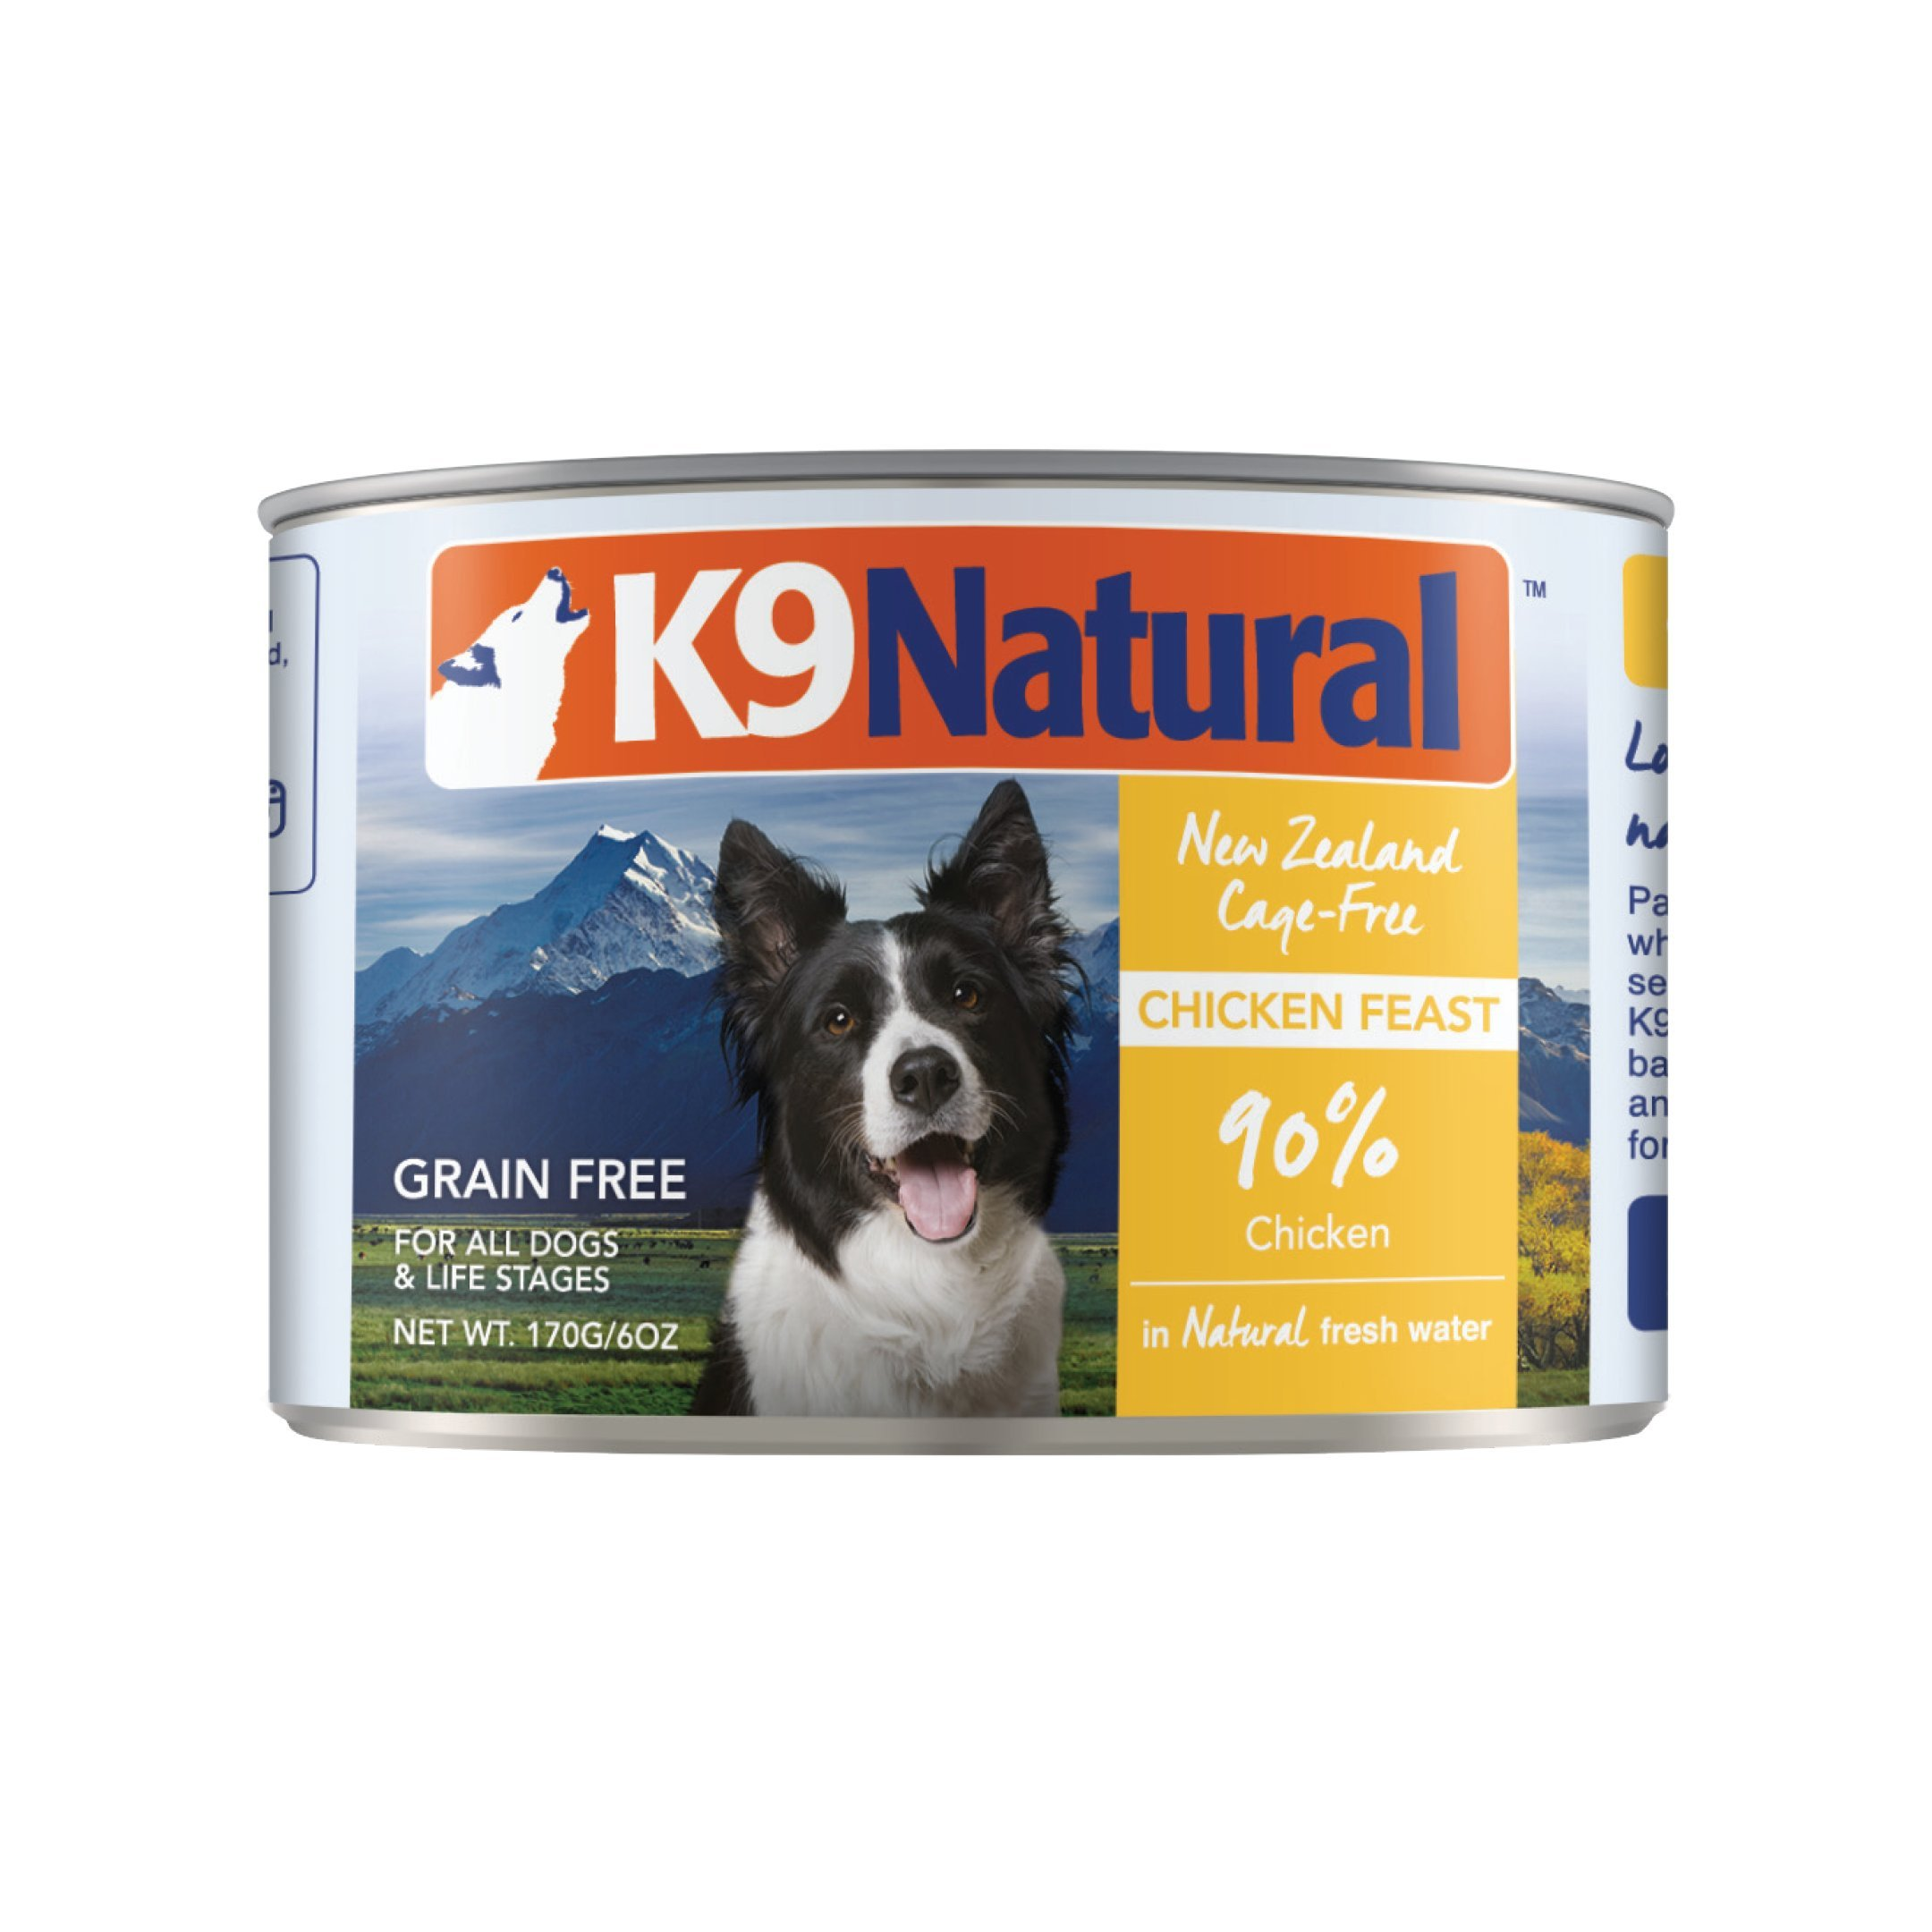 K9 Natural Can Dog Food Chicken 6oz (24 Pack)